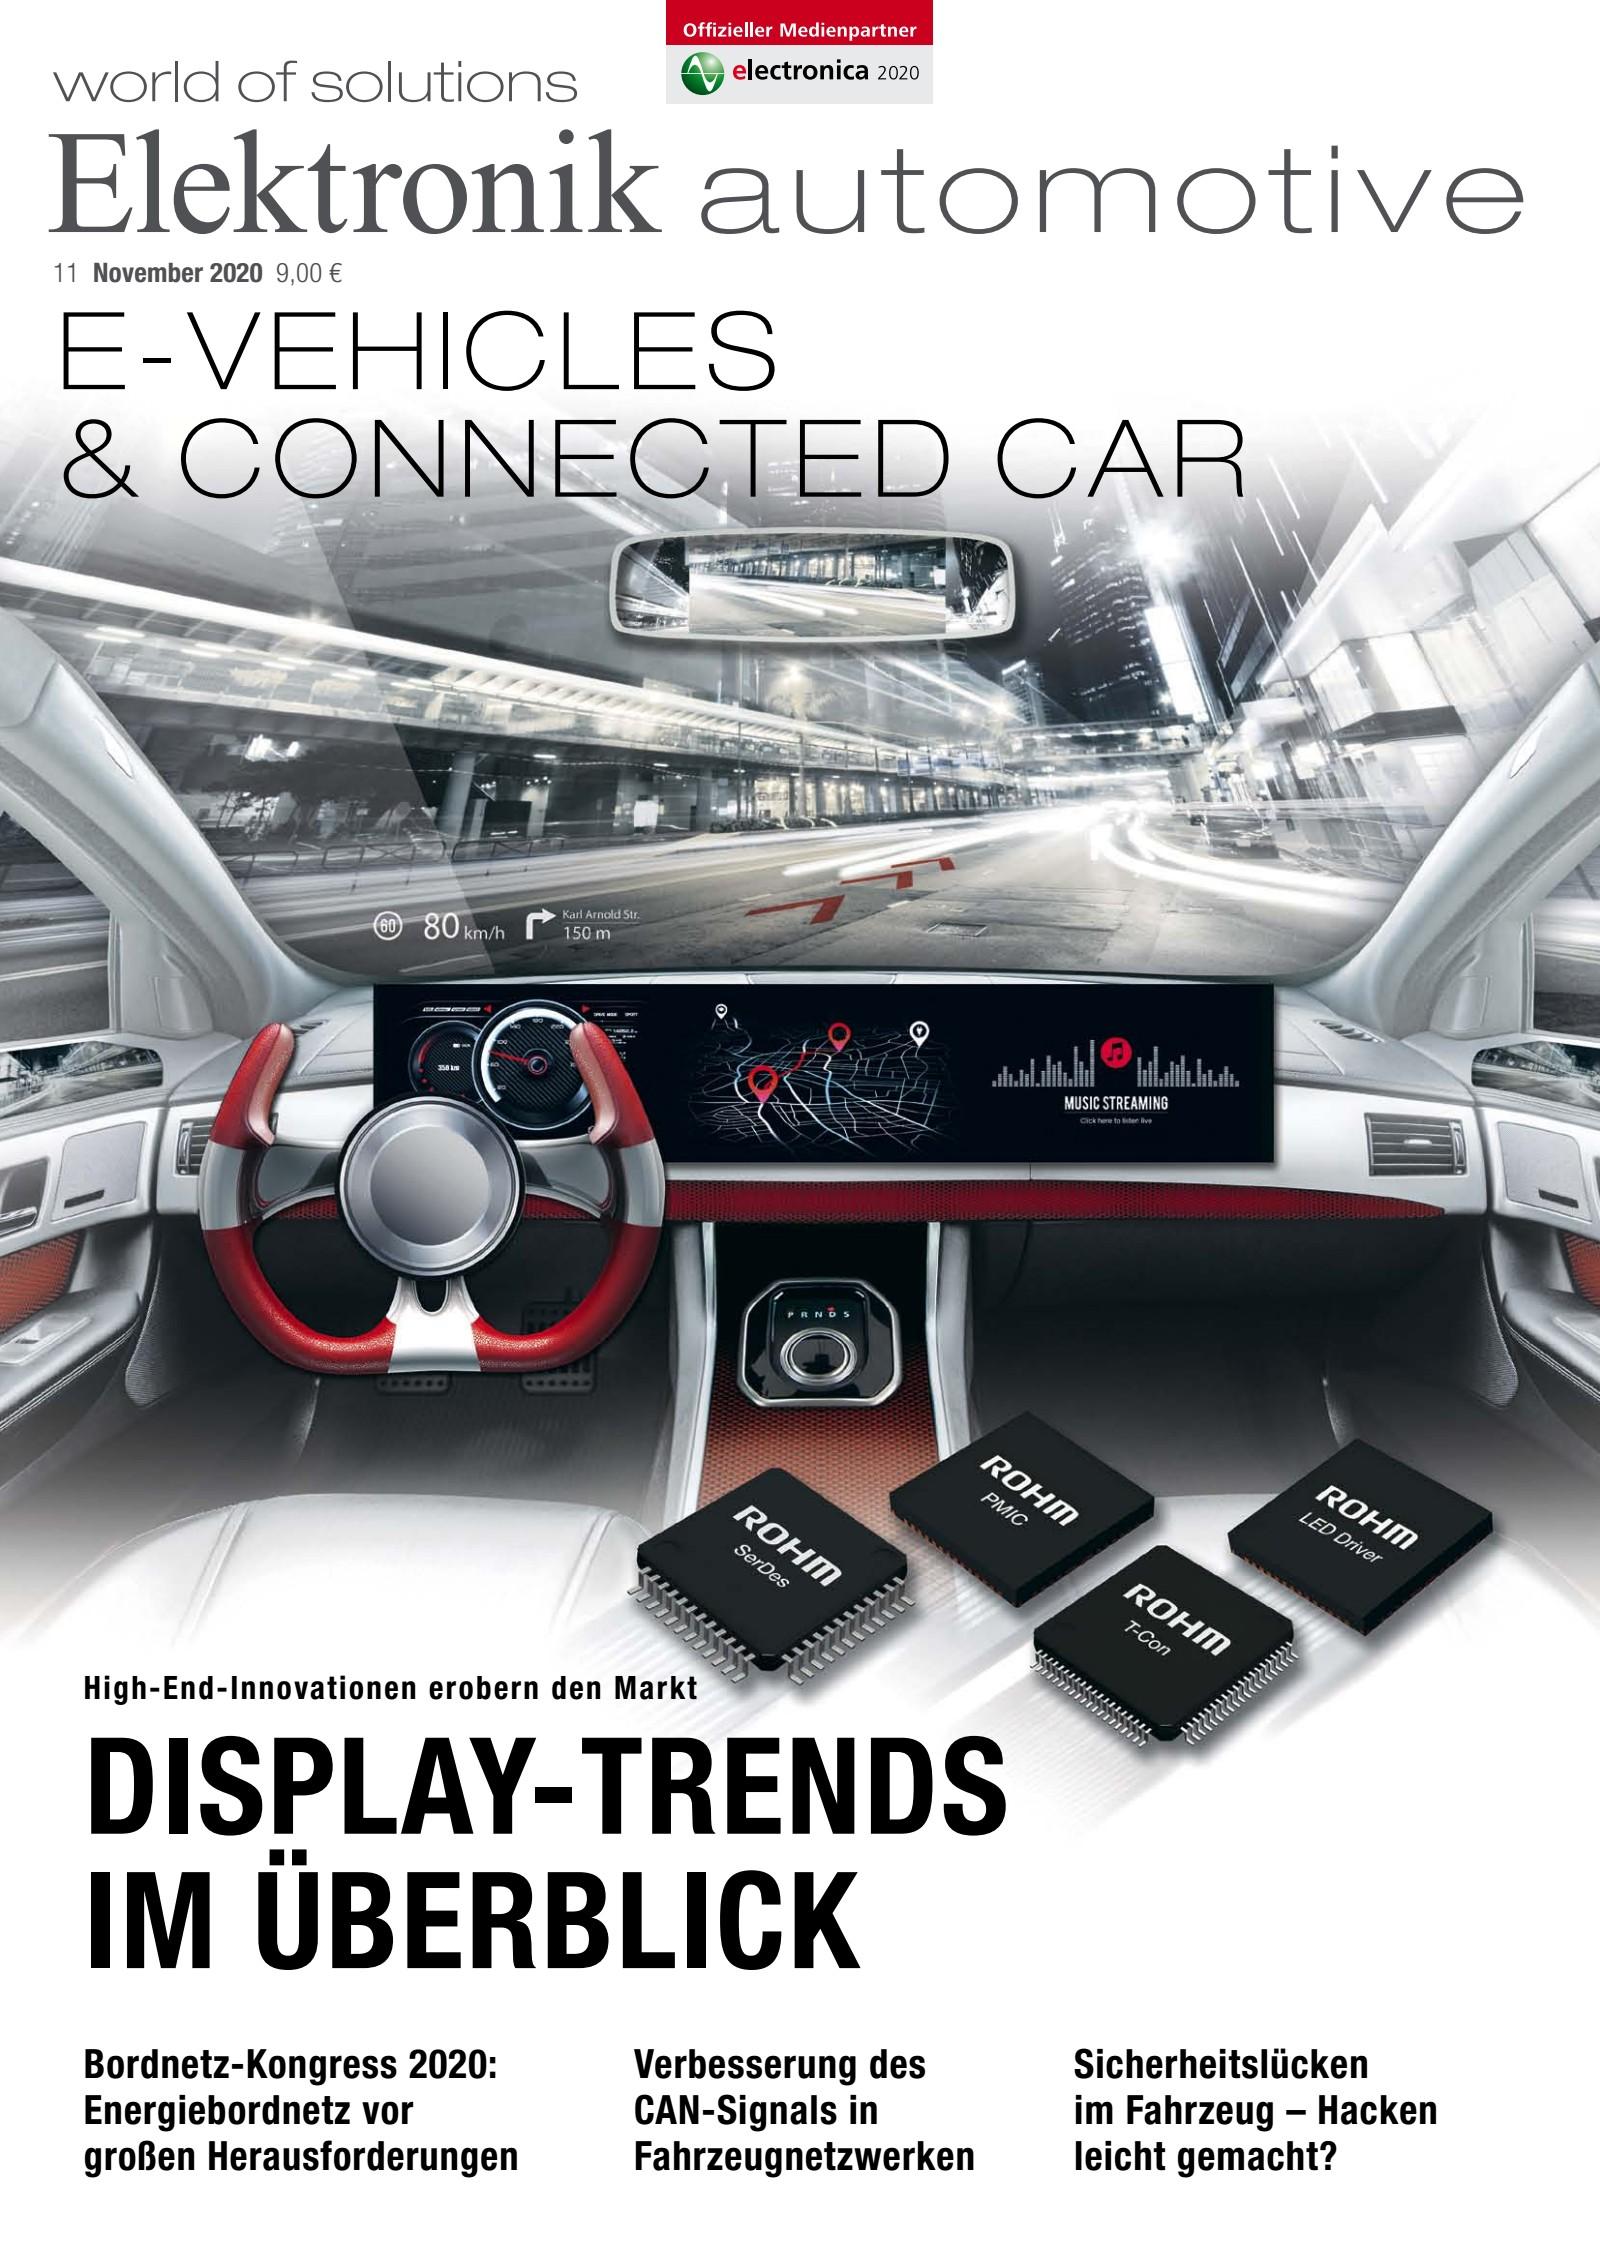 Elektronik automotive 11/2020 Digital